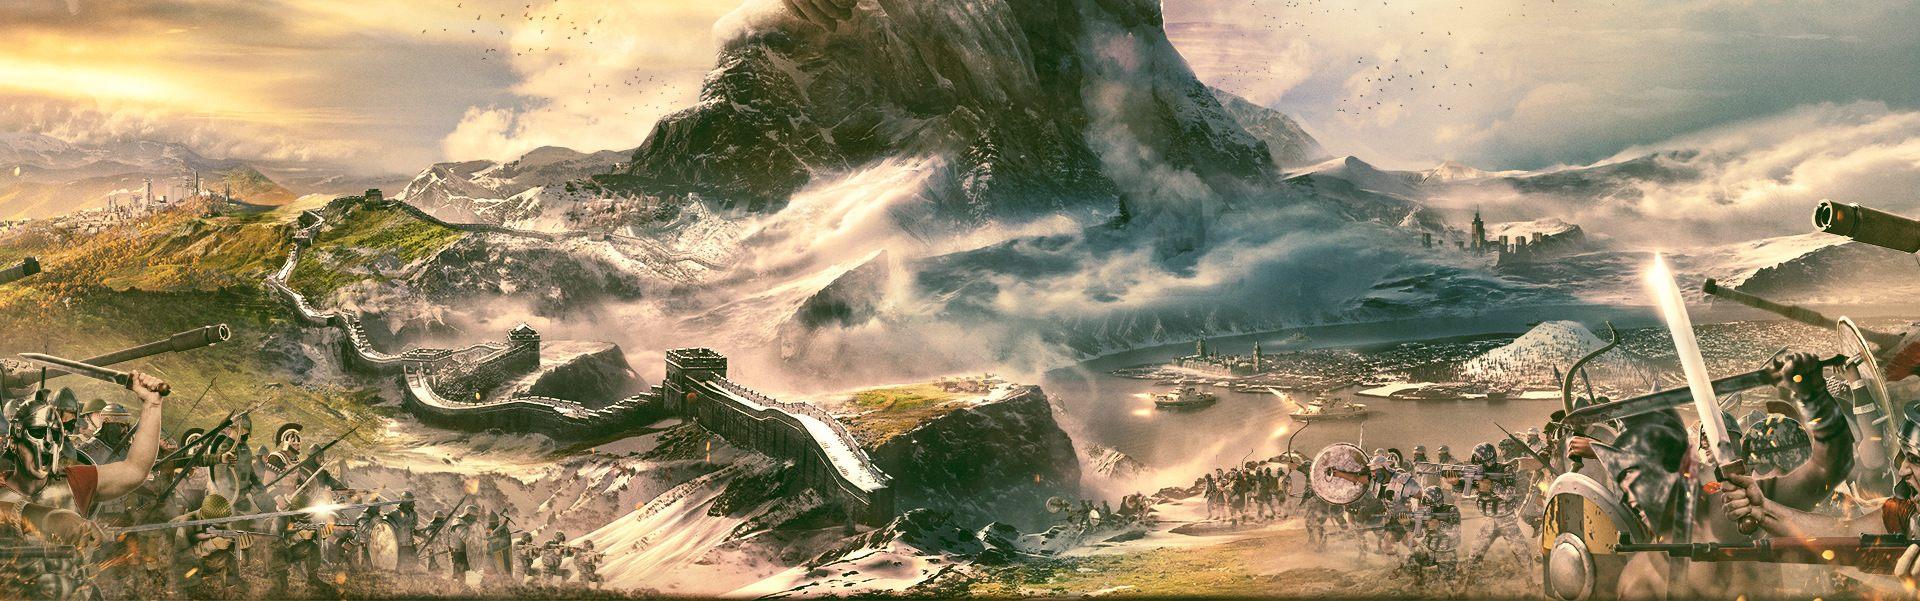 Sid Meier's Civilization VI - Australia Civilization & Scenario Pack (DLC) Steam Key GLOBAL